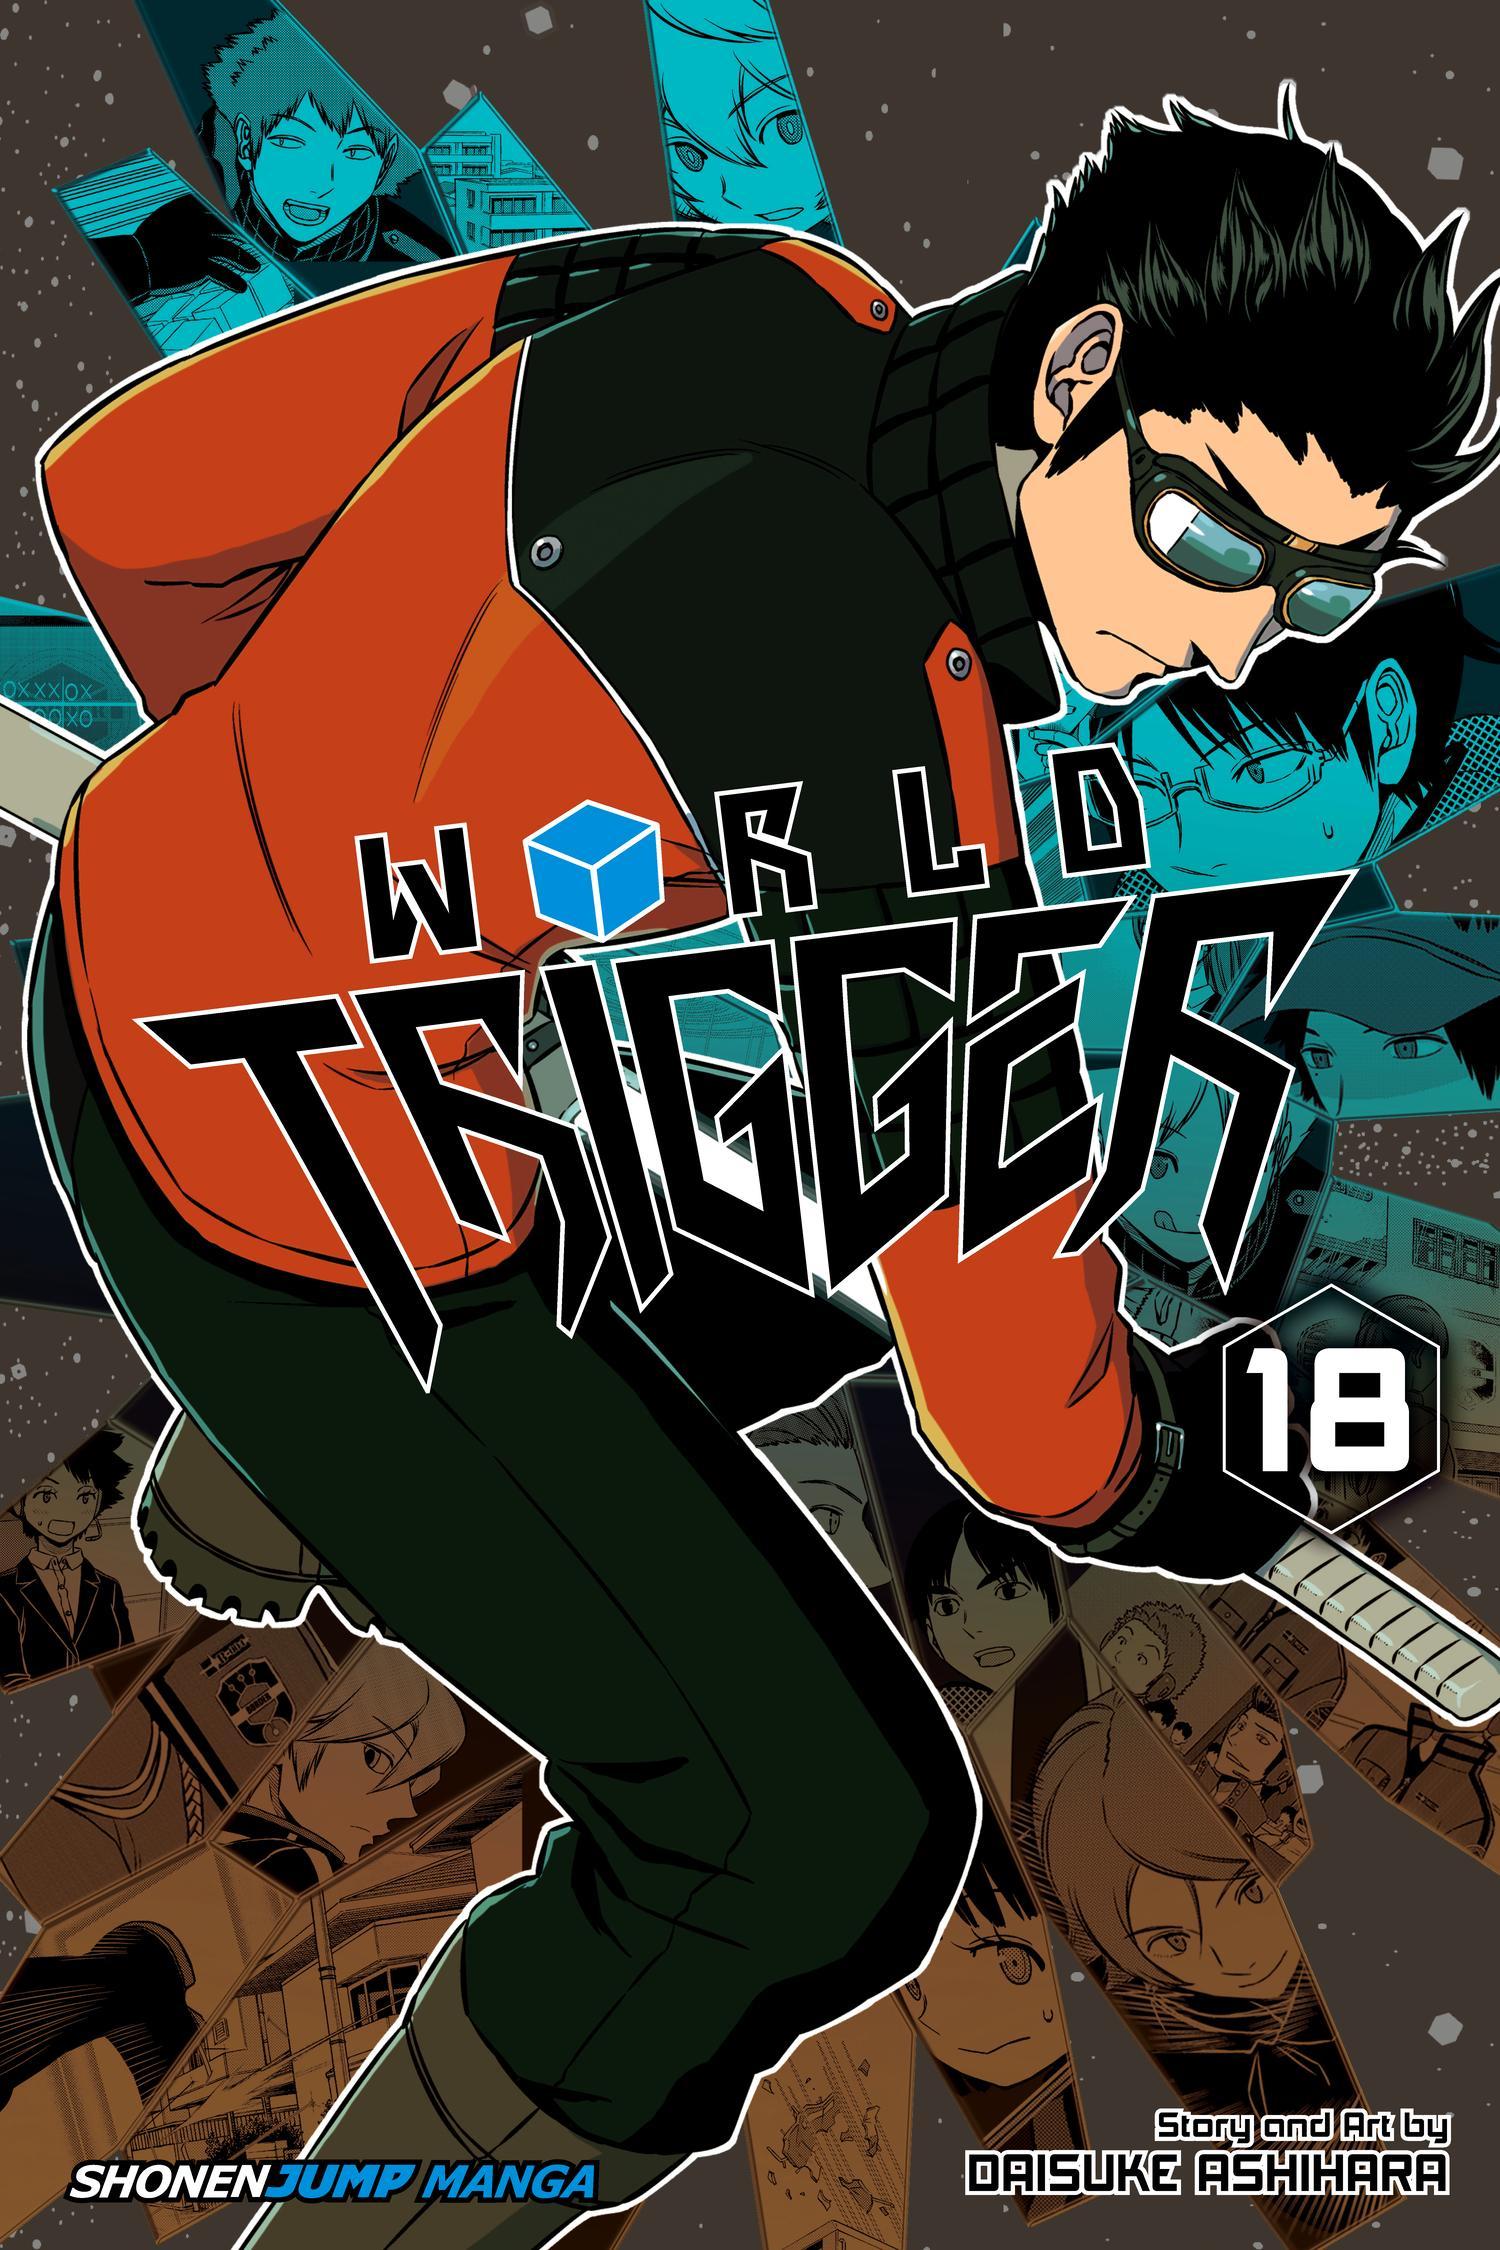 World Trigger v18 2018 Digital LuCaZ